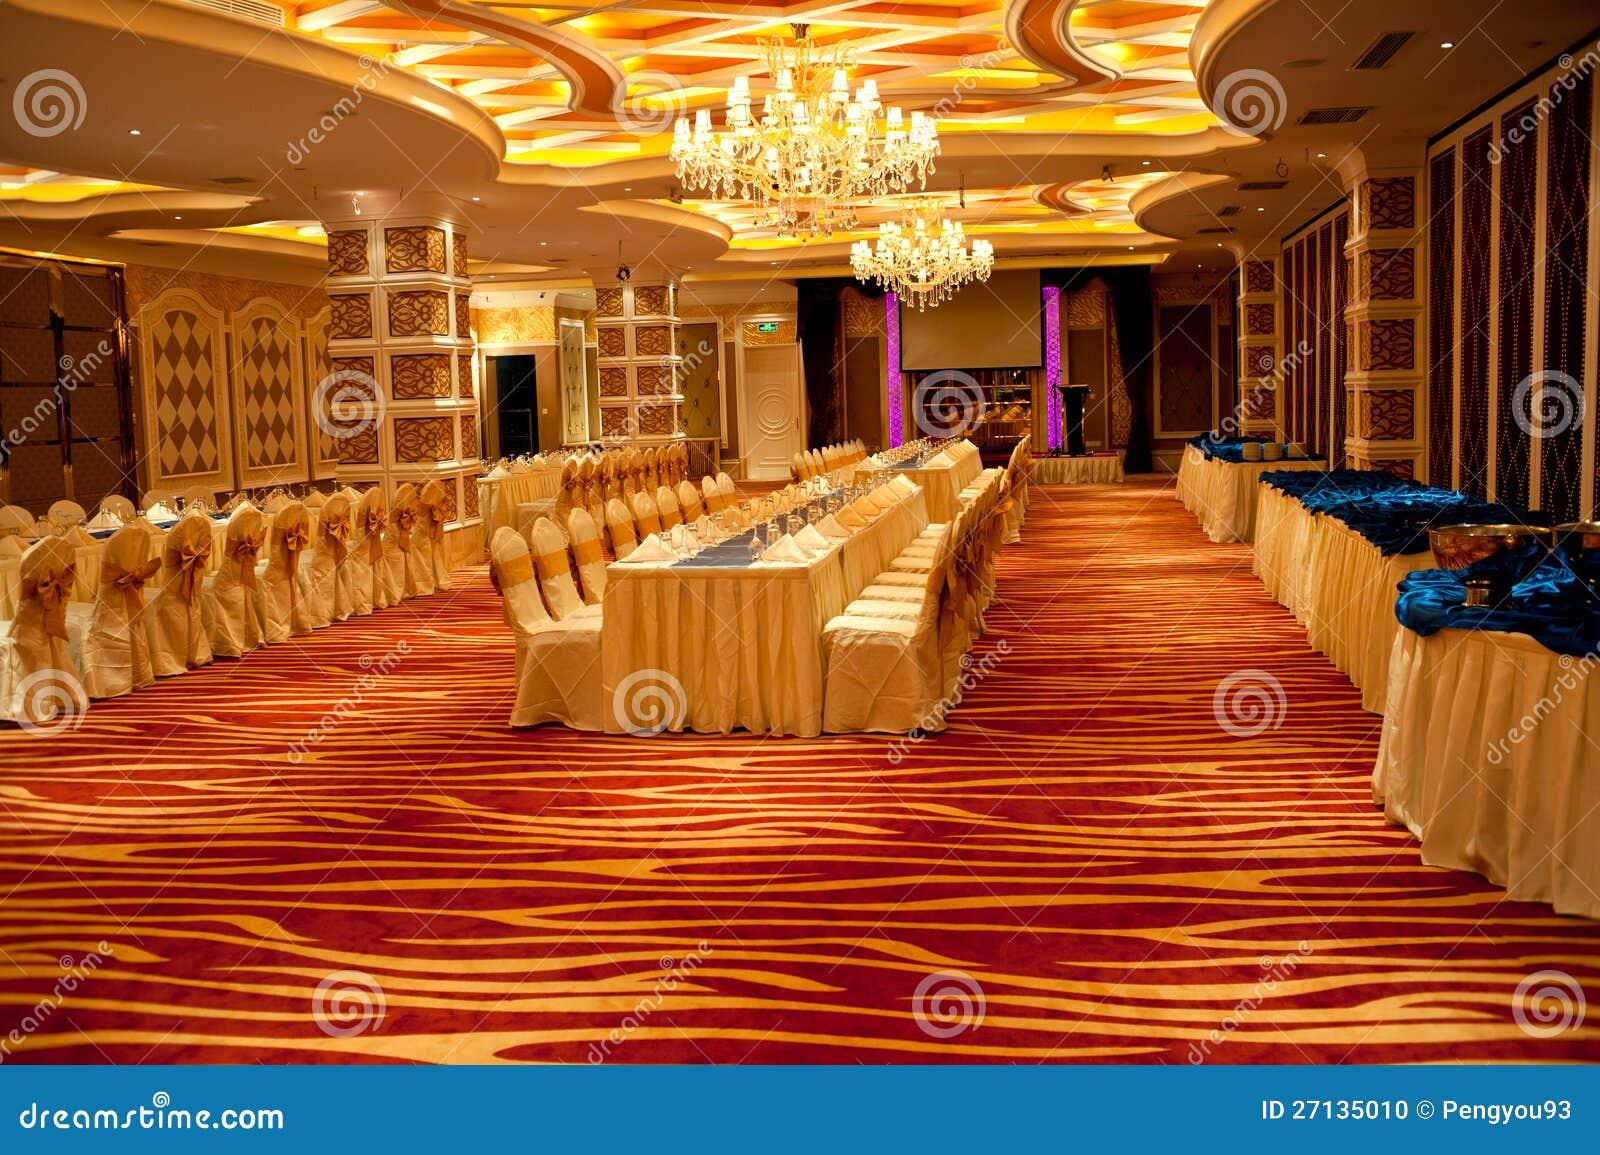 Ballroom Interior Design Stock Photo Image 27135010